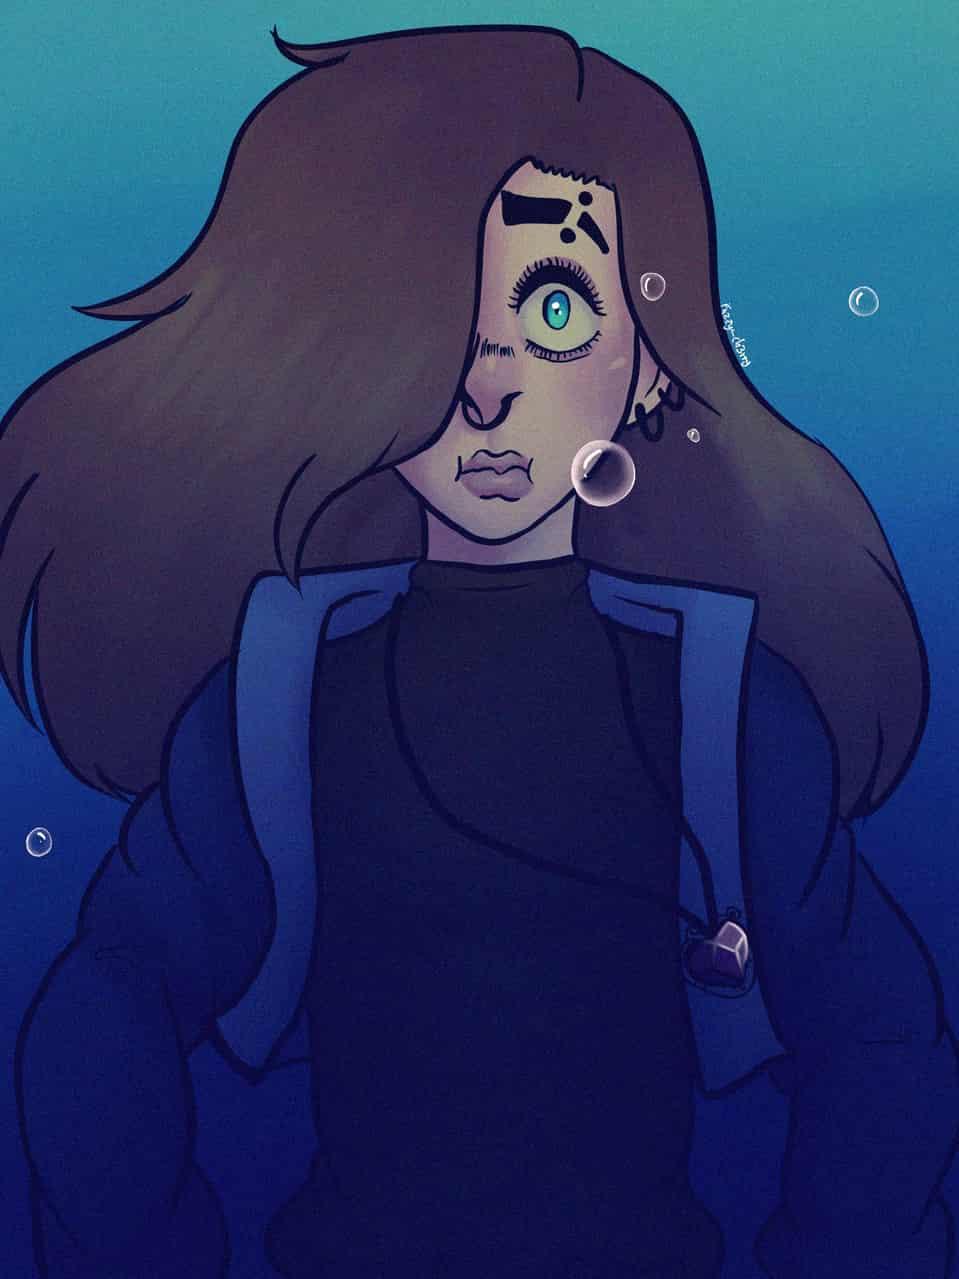 Goretober day 15: under water Illust of Unwanted_Heathen piercing boy blue Goretober eyes oc medibangpaint Fuzzy_ch3rry gore